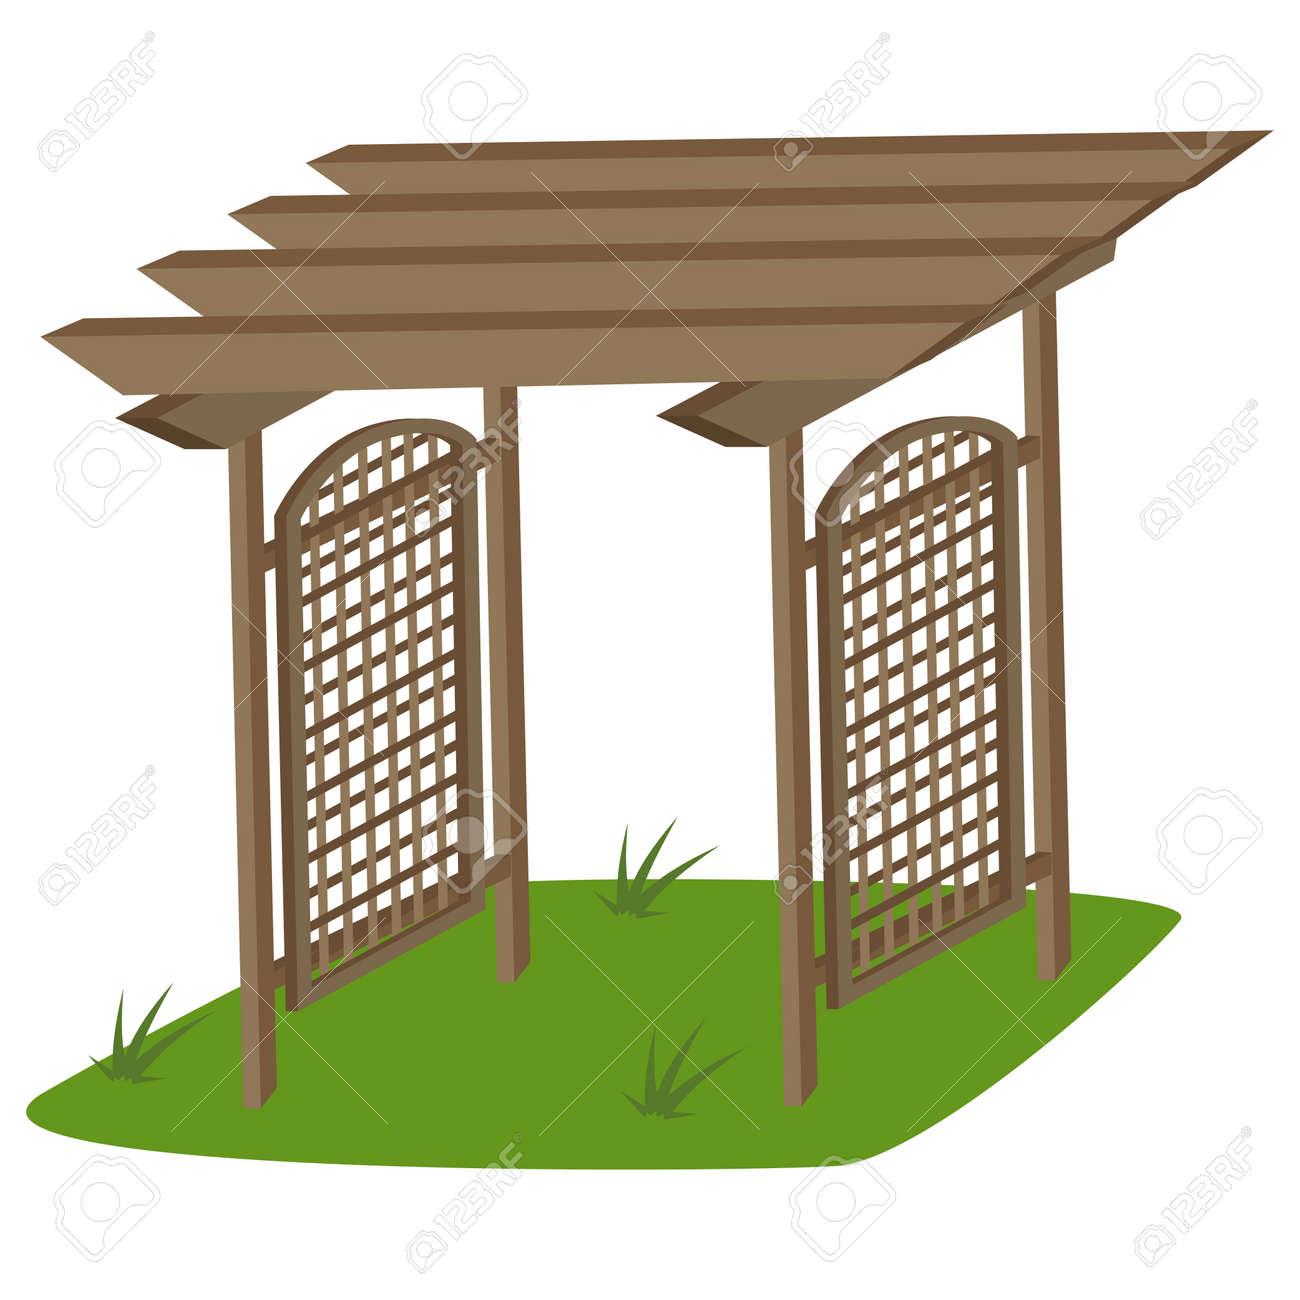 Garden Trellis Of Teak For Garden Vector Cartoon Illustration